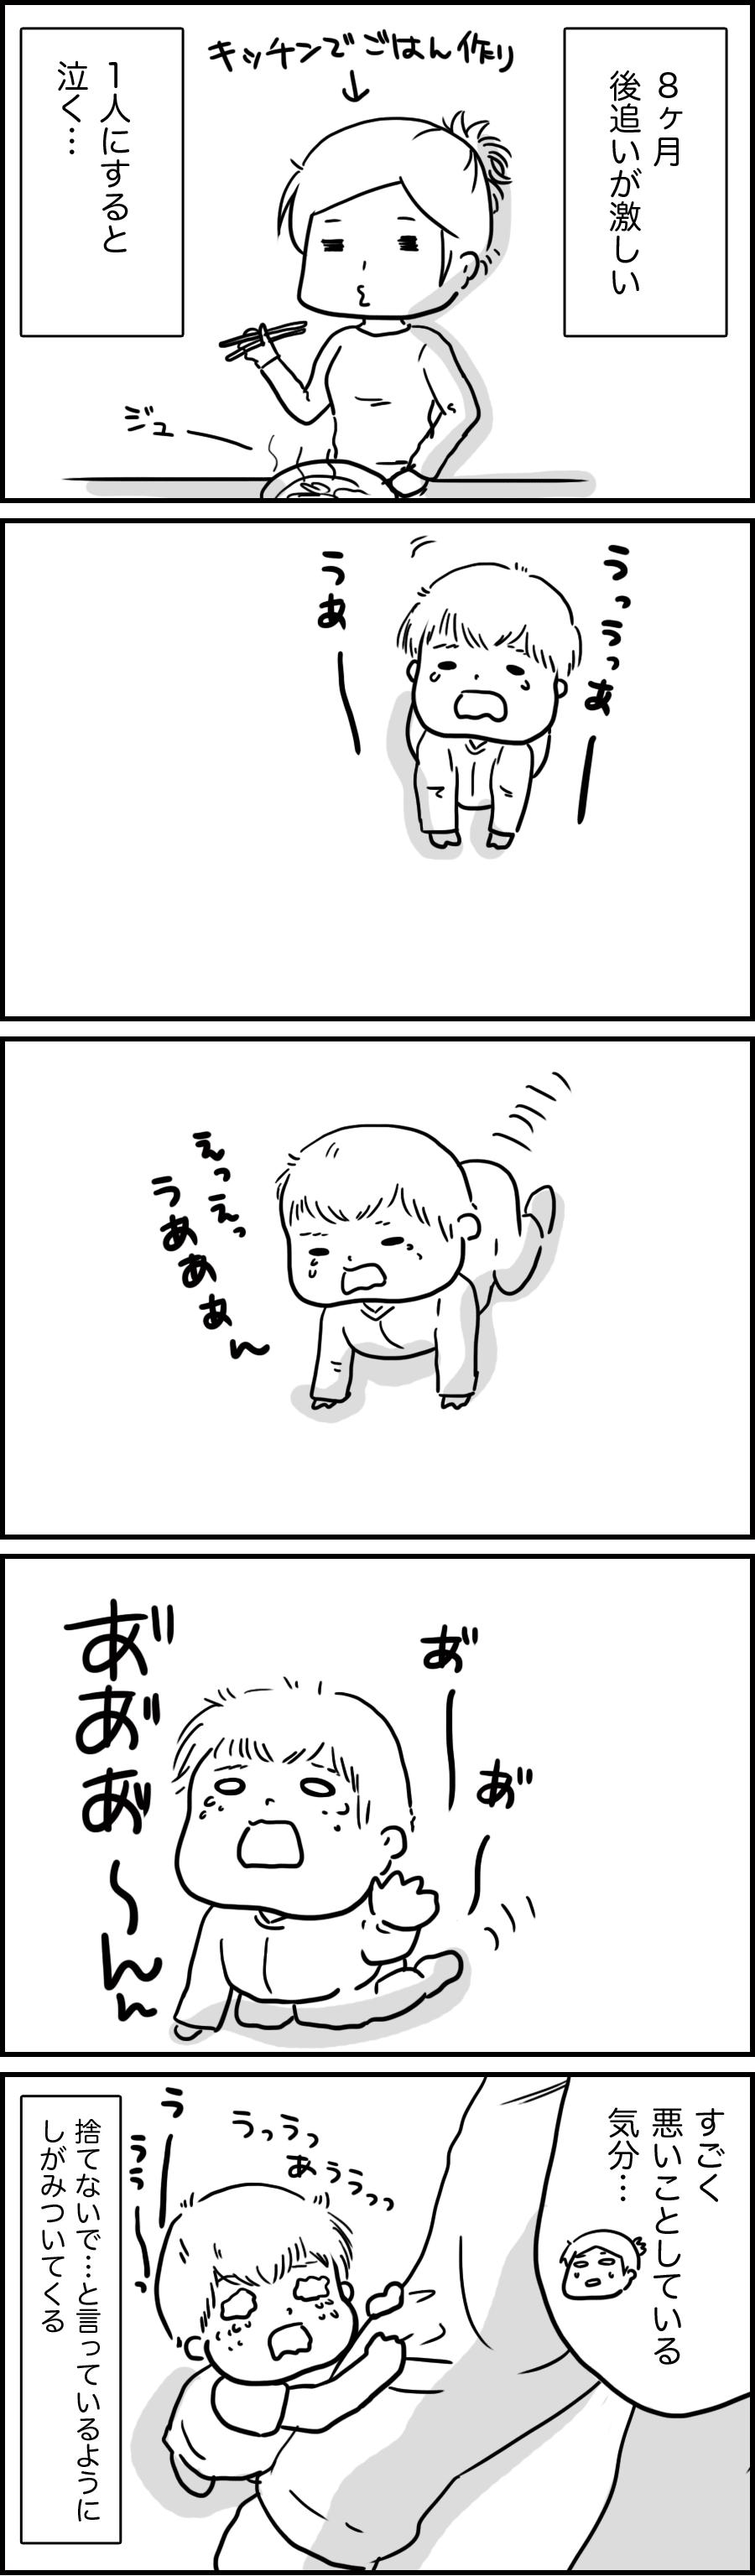 20160917